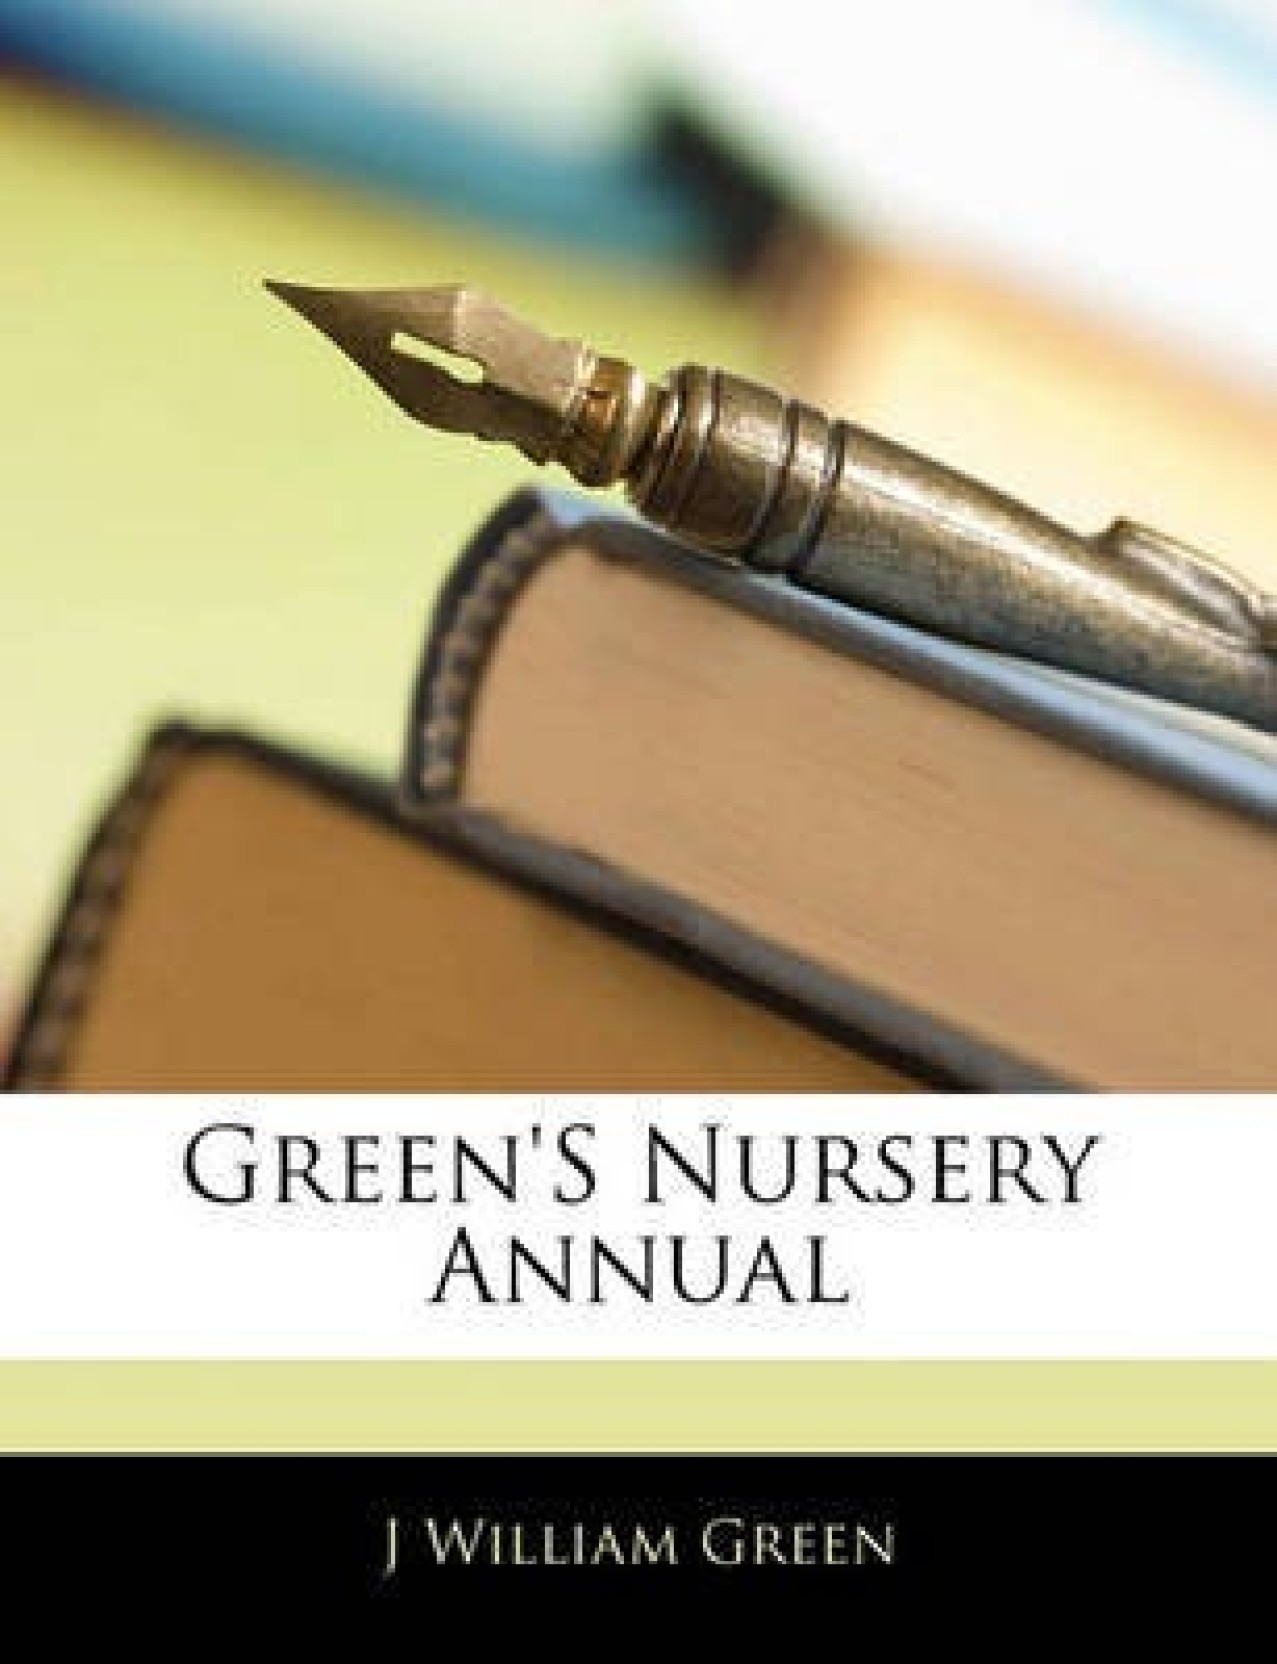 Green's Nursery Annual: Buy Green's Nursery Annual by Green